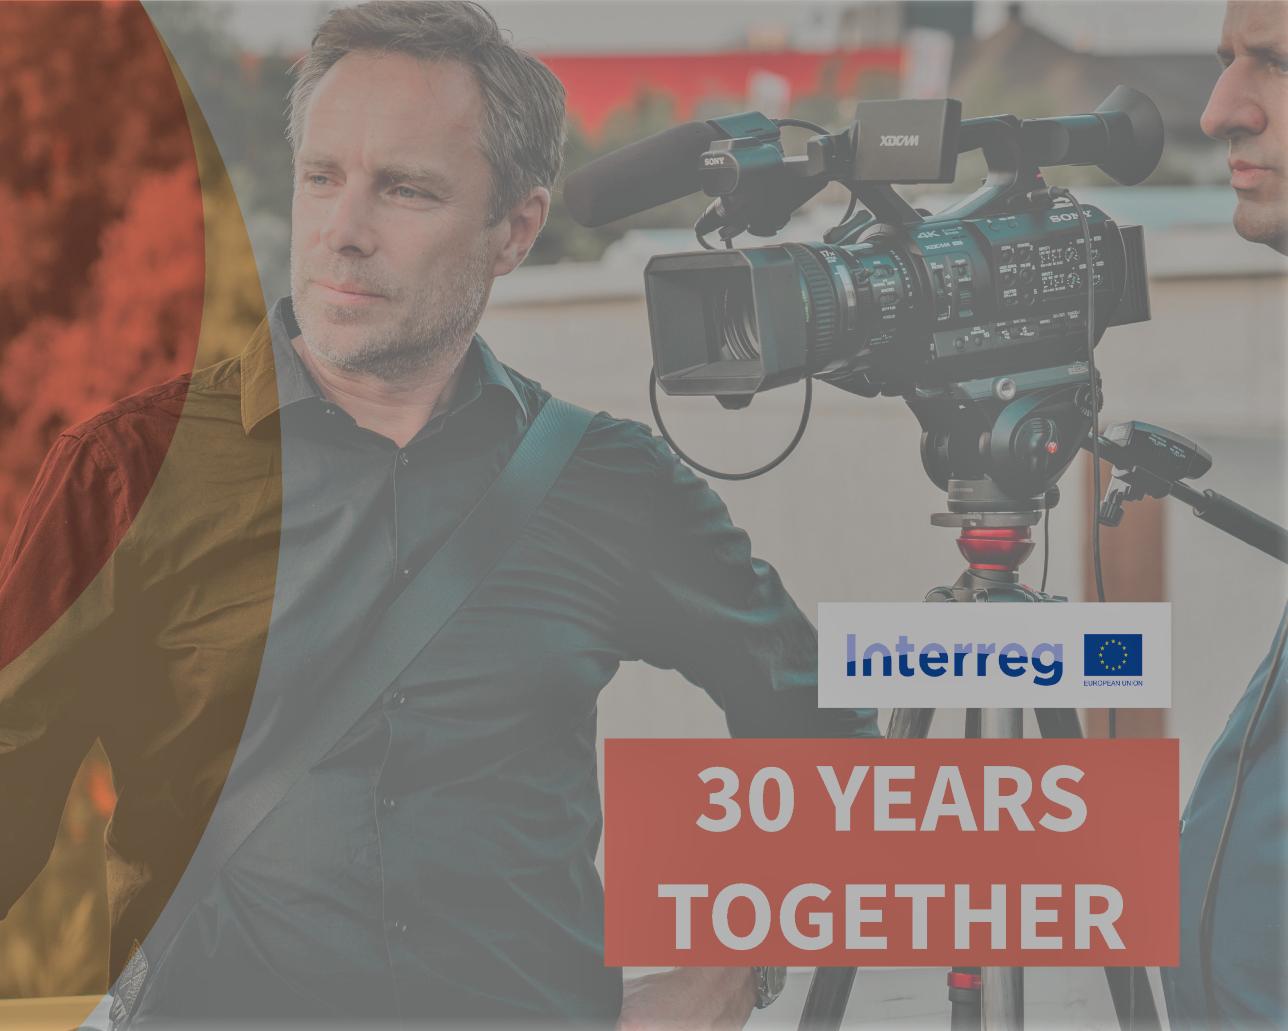 Interreg 30 Years Together